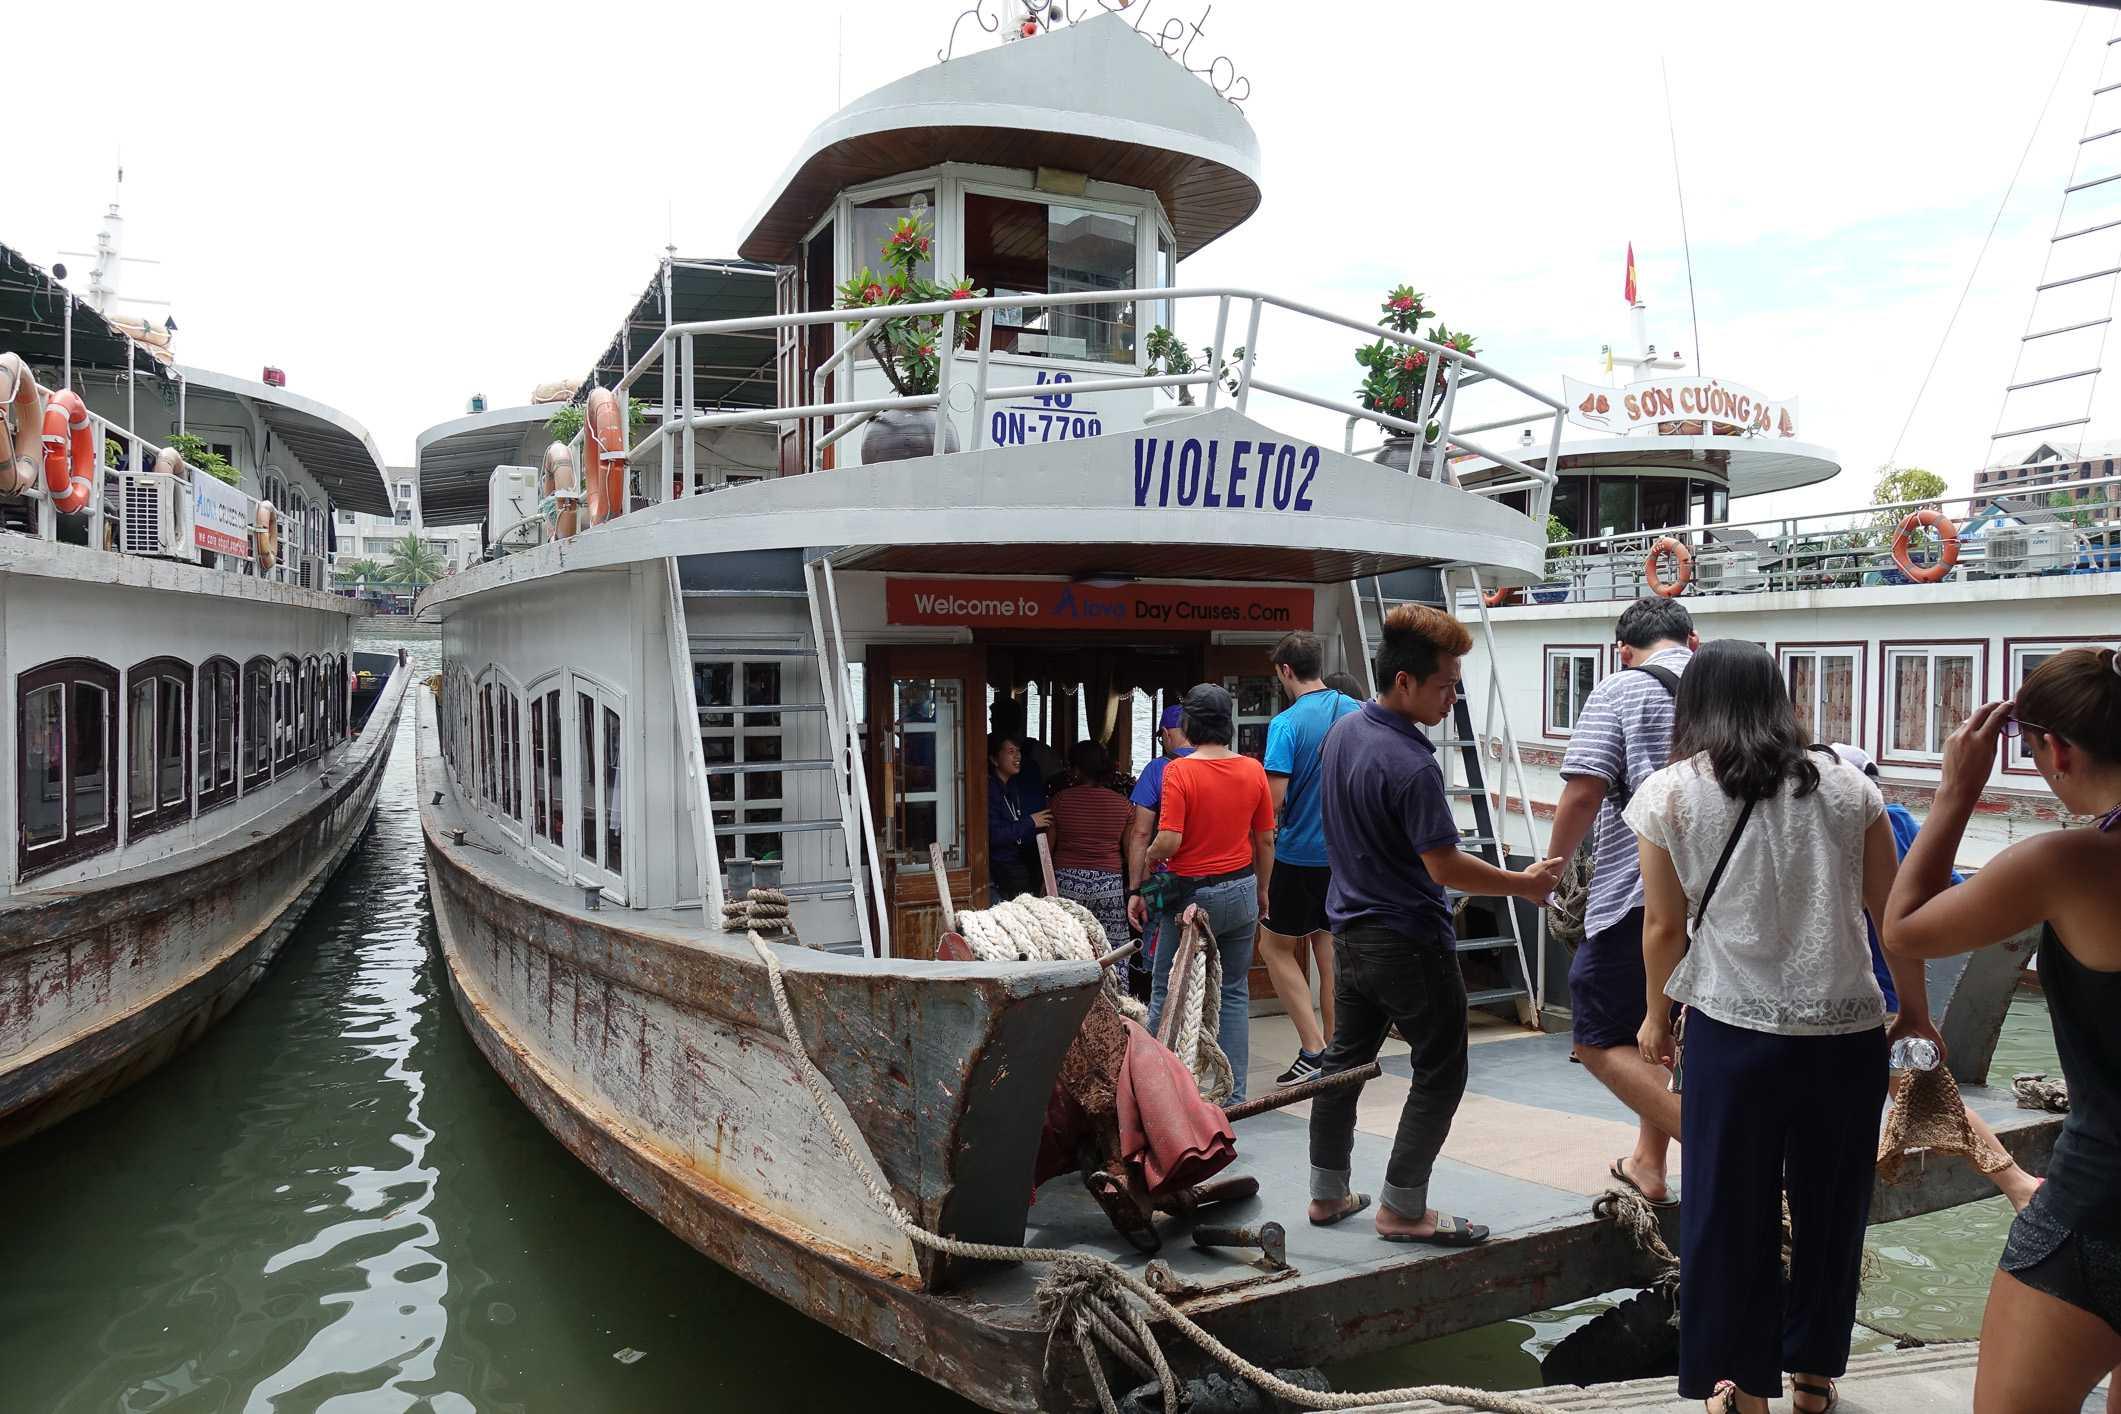 Boarding the ship in Ha Long Bay